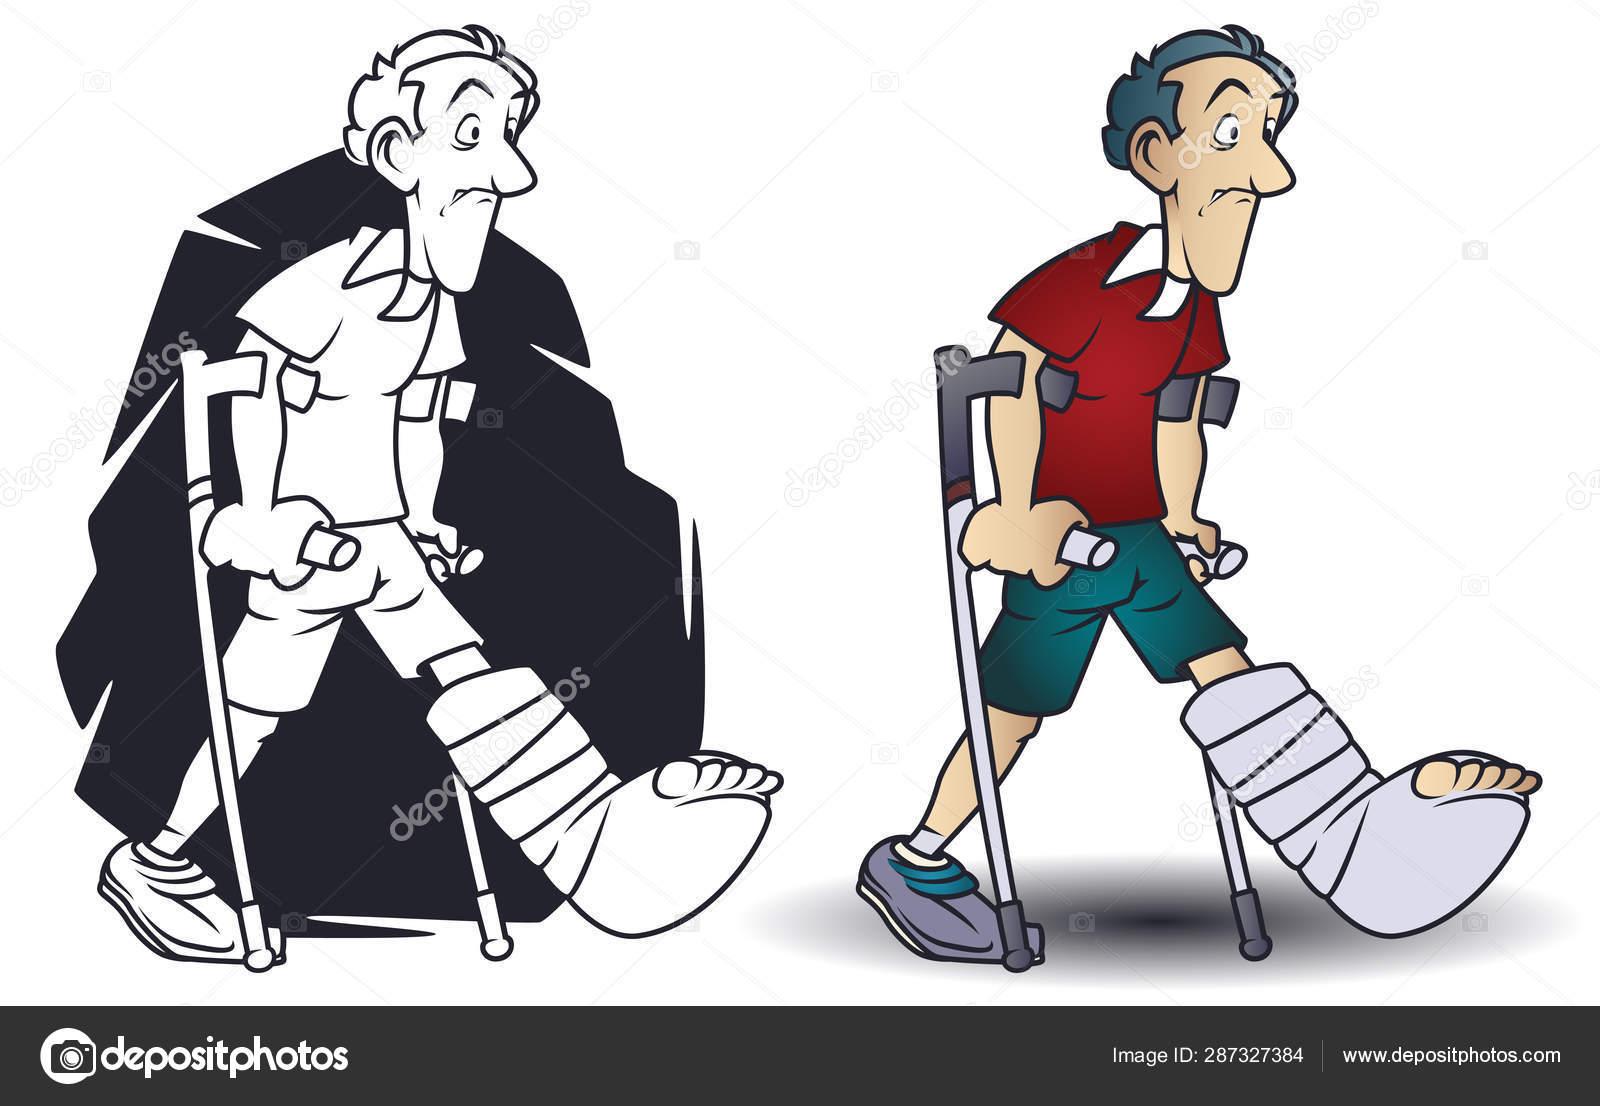 ᐈ Funny Cartoons Royalty Free Crutch Cartoon Funny Pics Download On Depositphotos